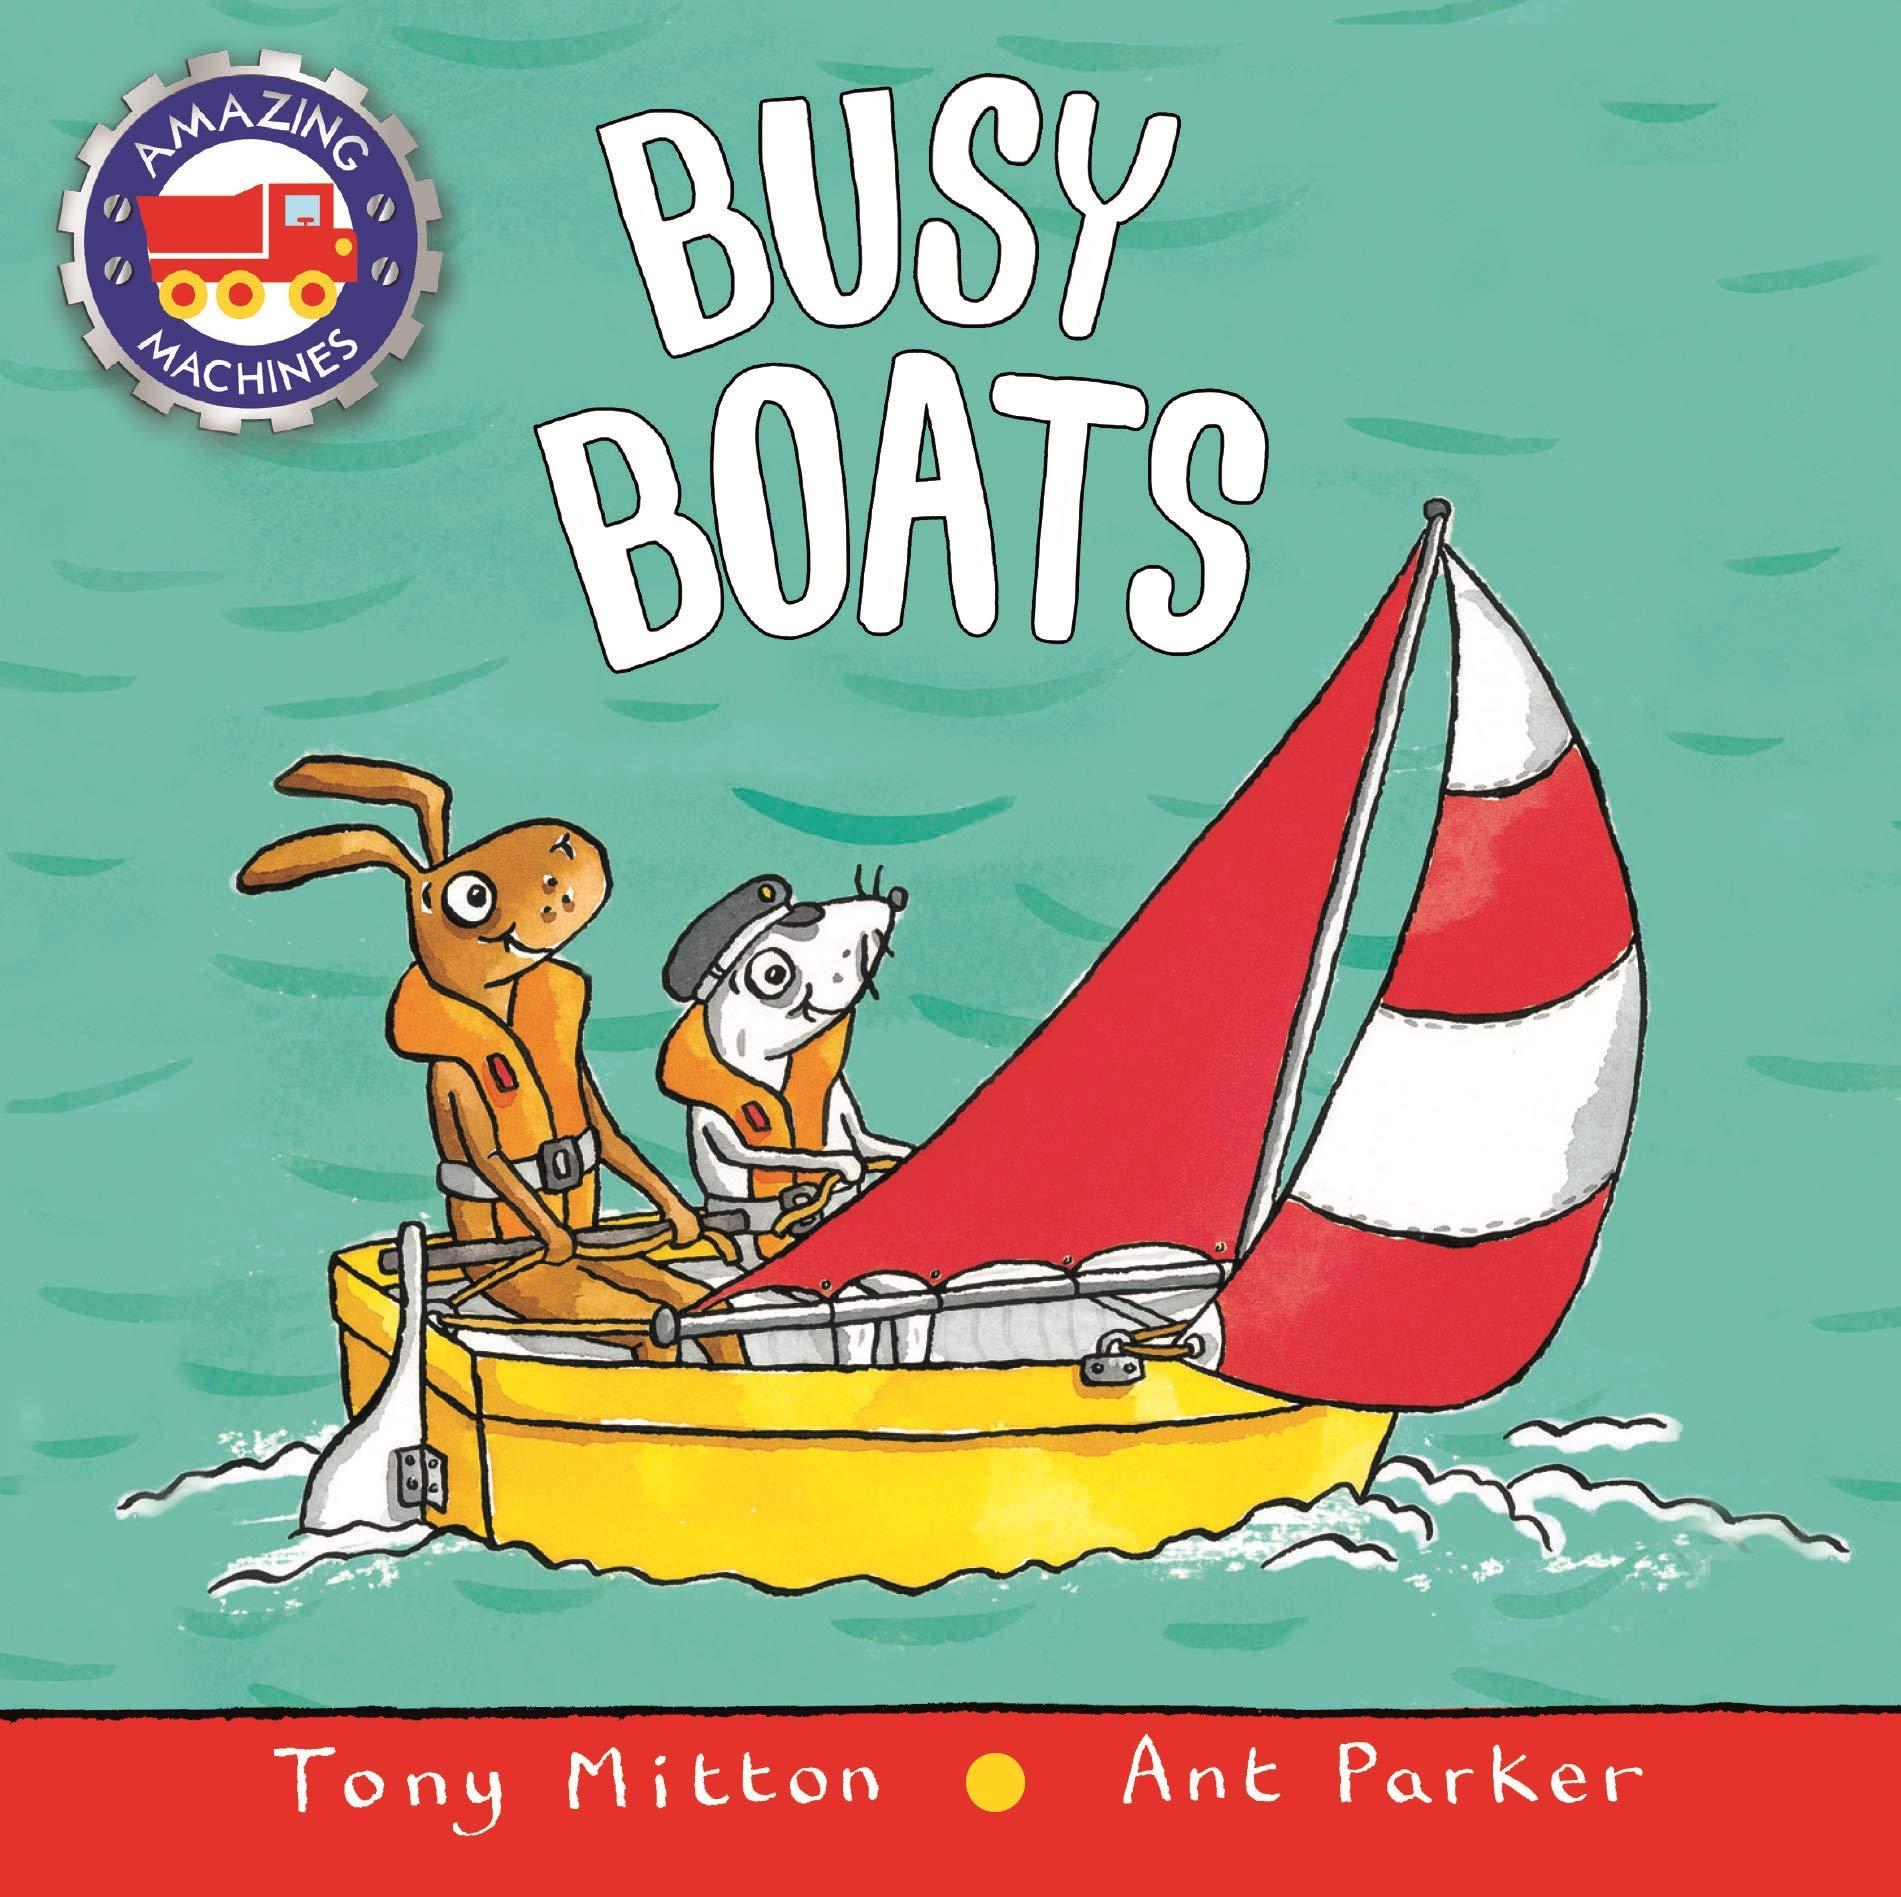 Amazon com: Busy Boats (Amazing Machines) (9780753459164